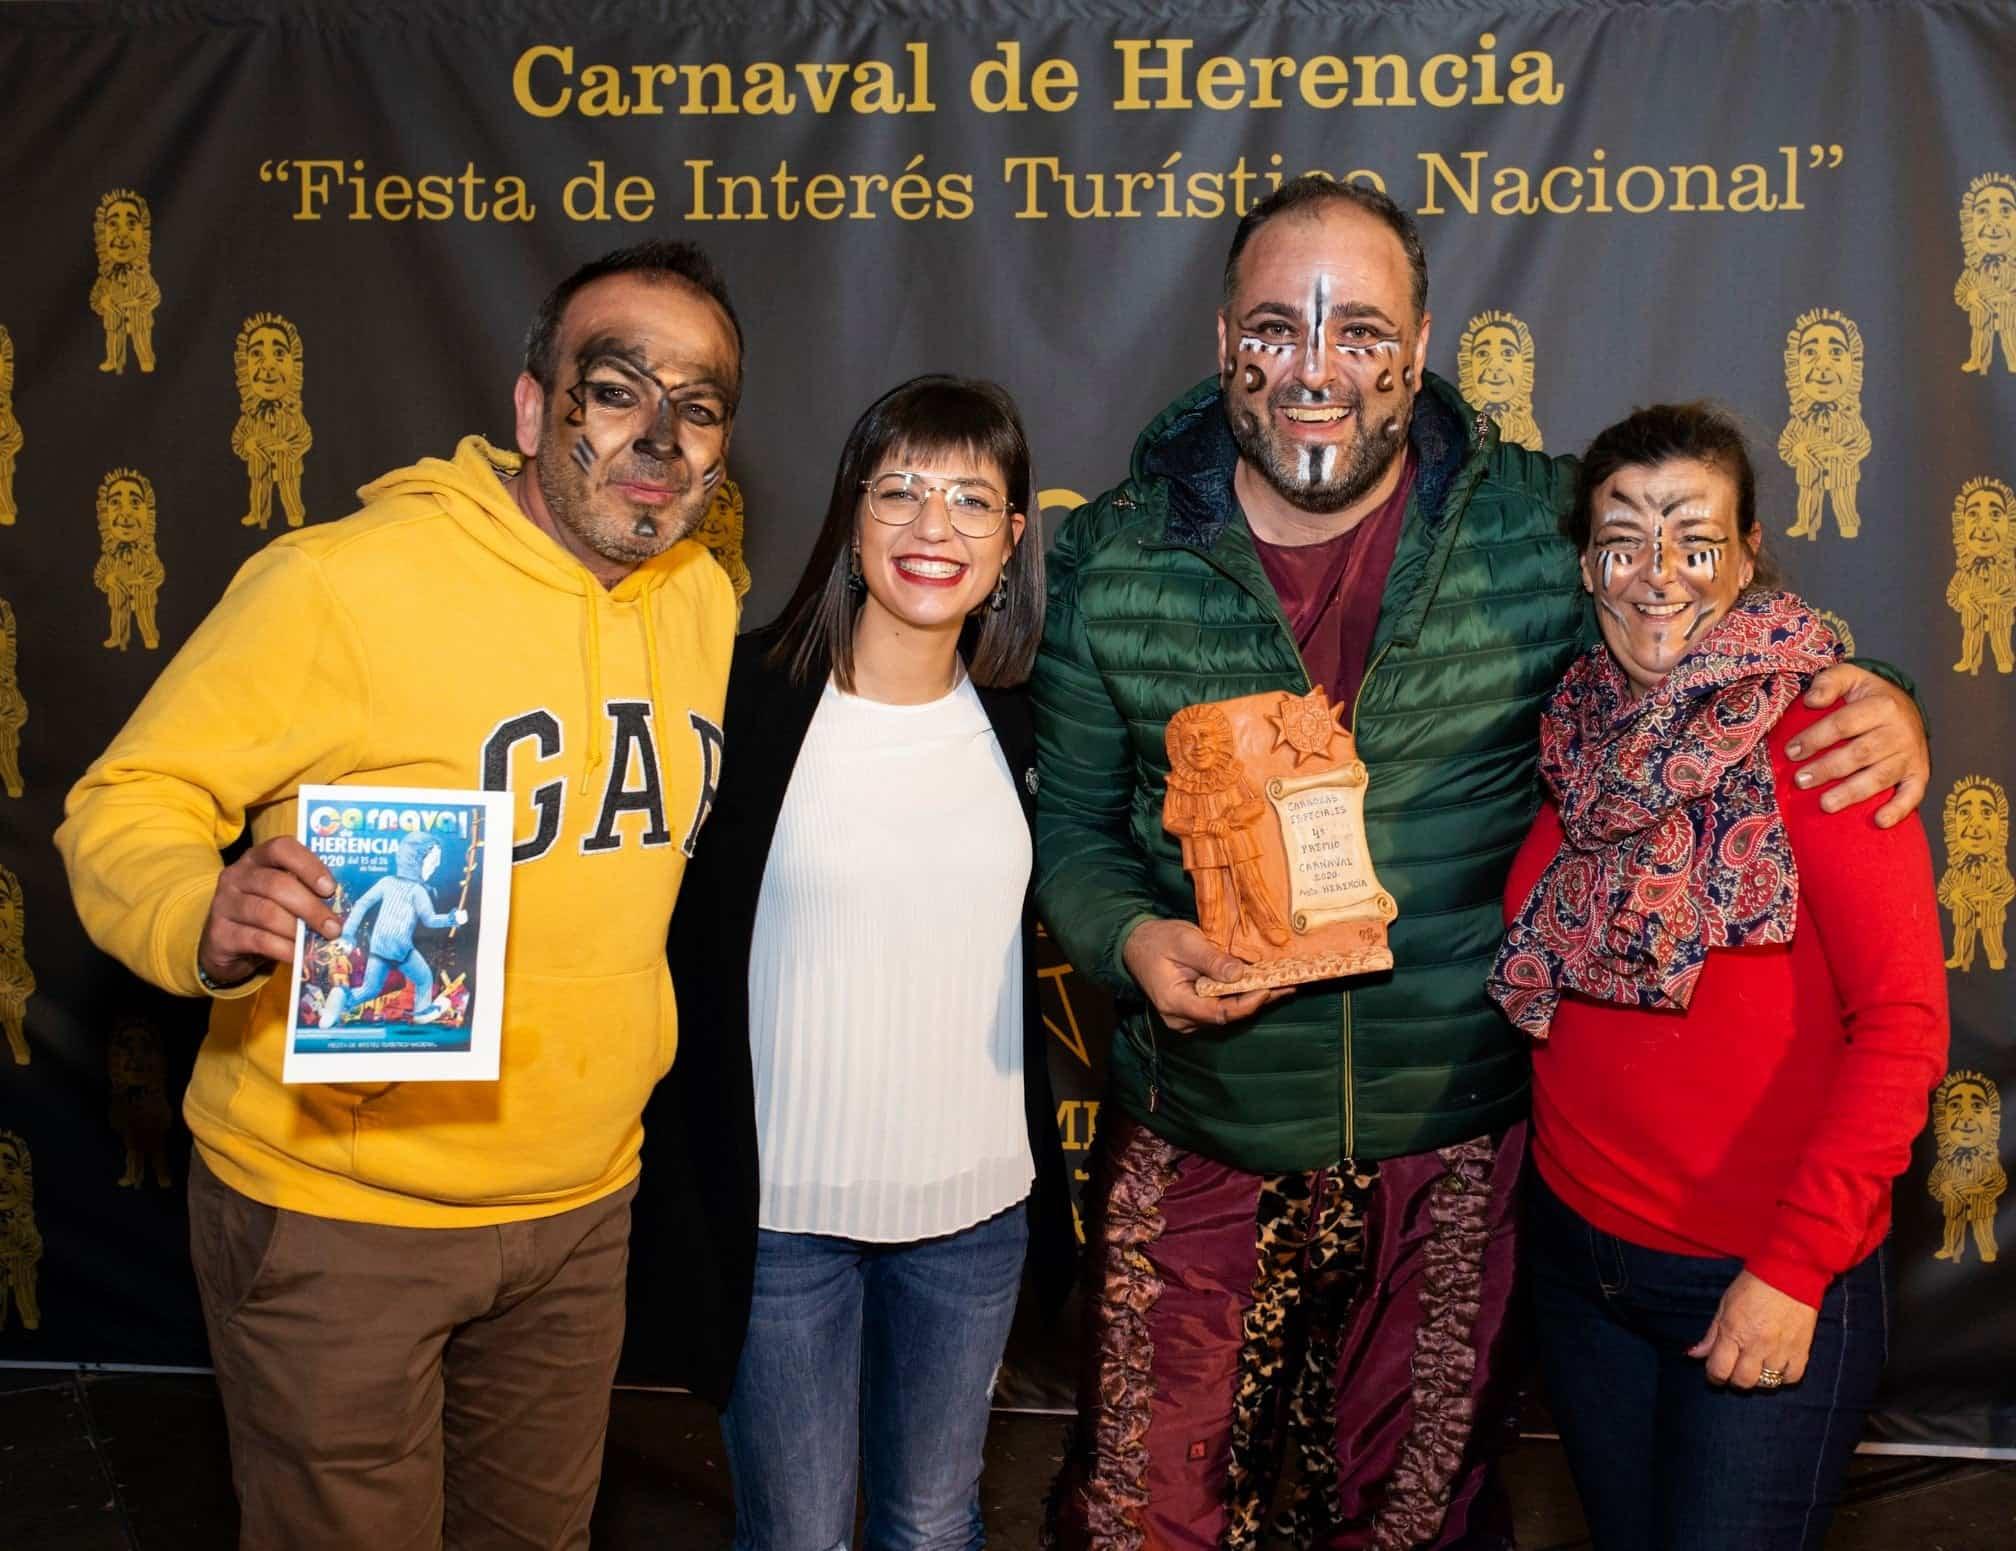 Carnaval de herencia 2020 ofertorio 88 - Selección de fotografías del Ofertorio del Carnaval de Herencia